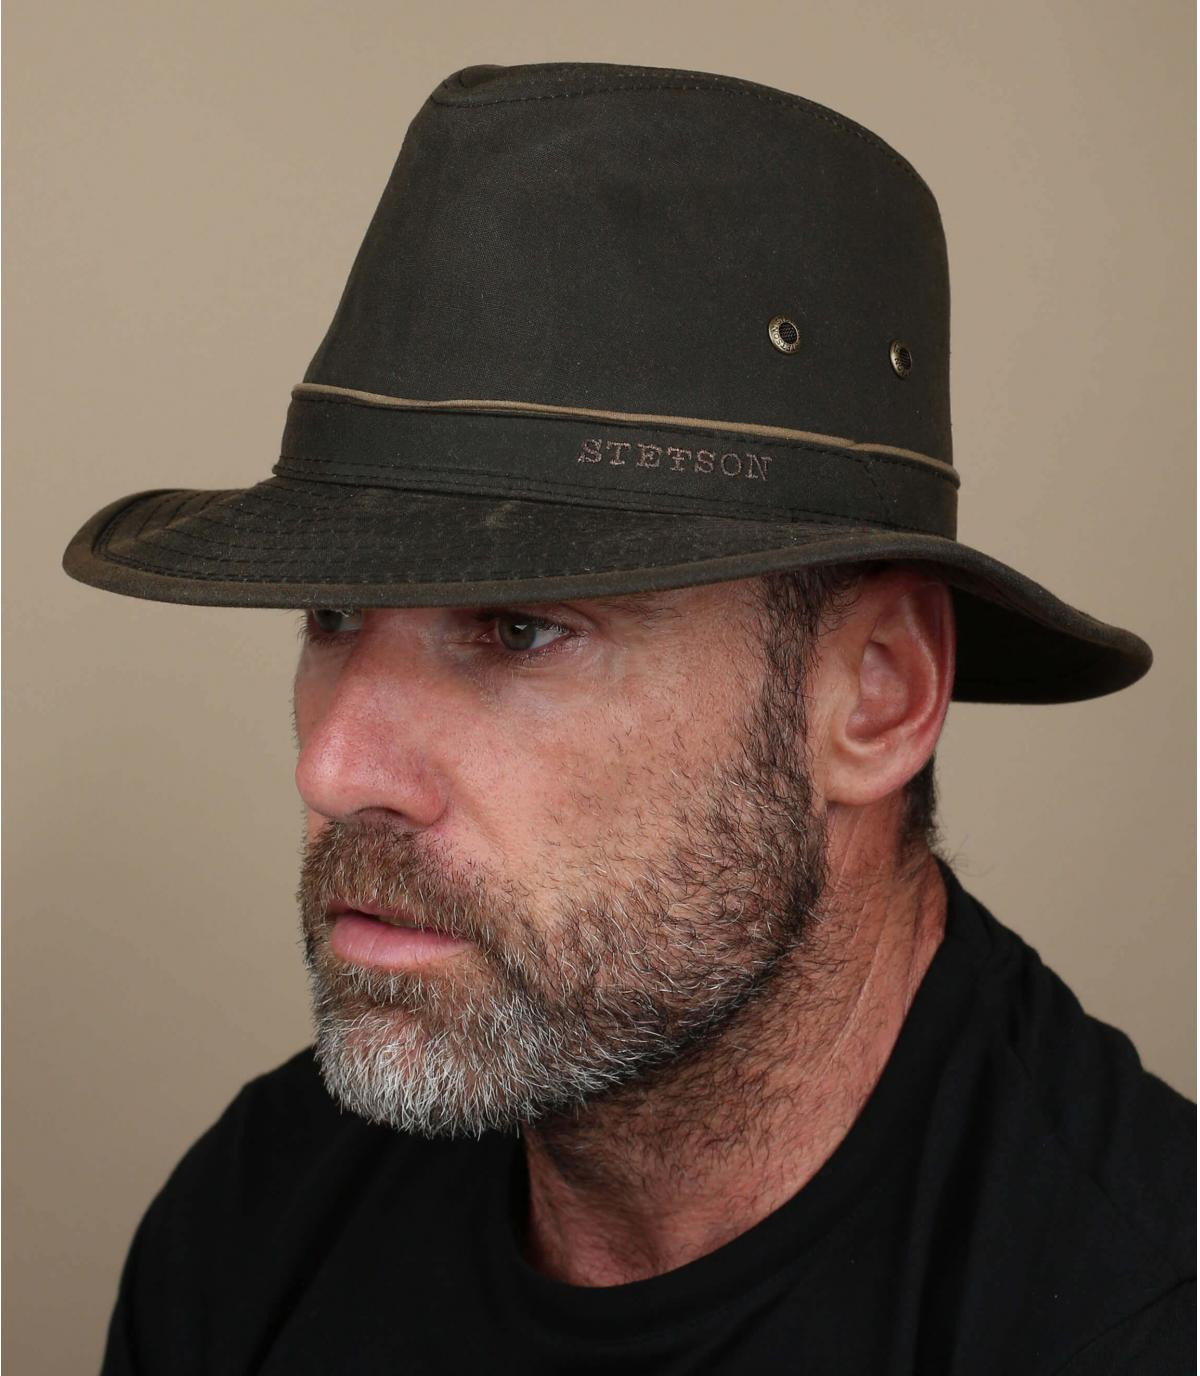 Sombrero ava stetson